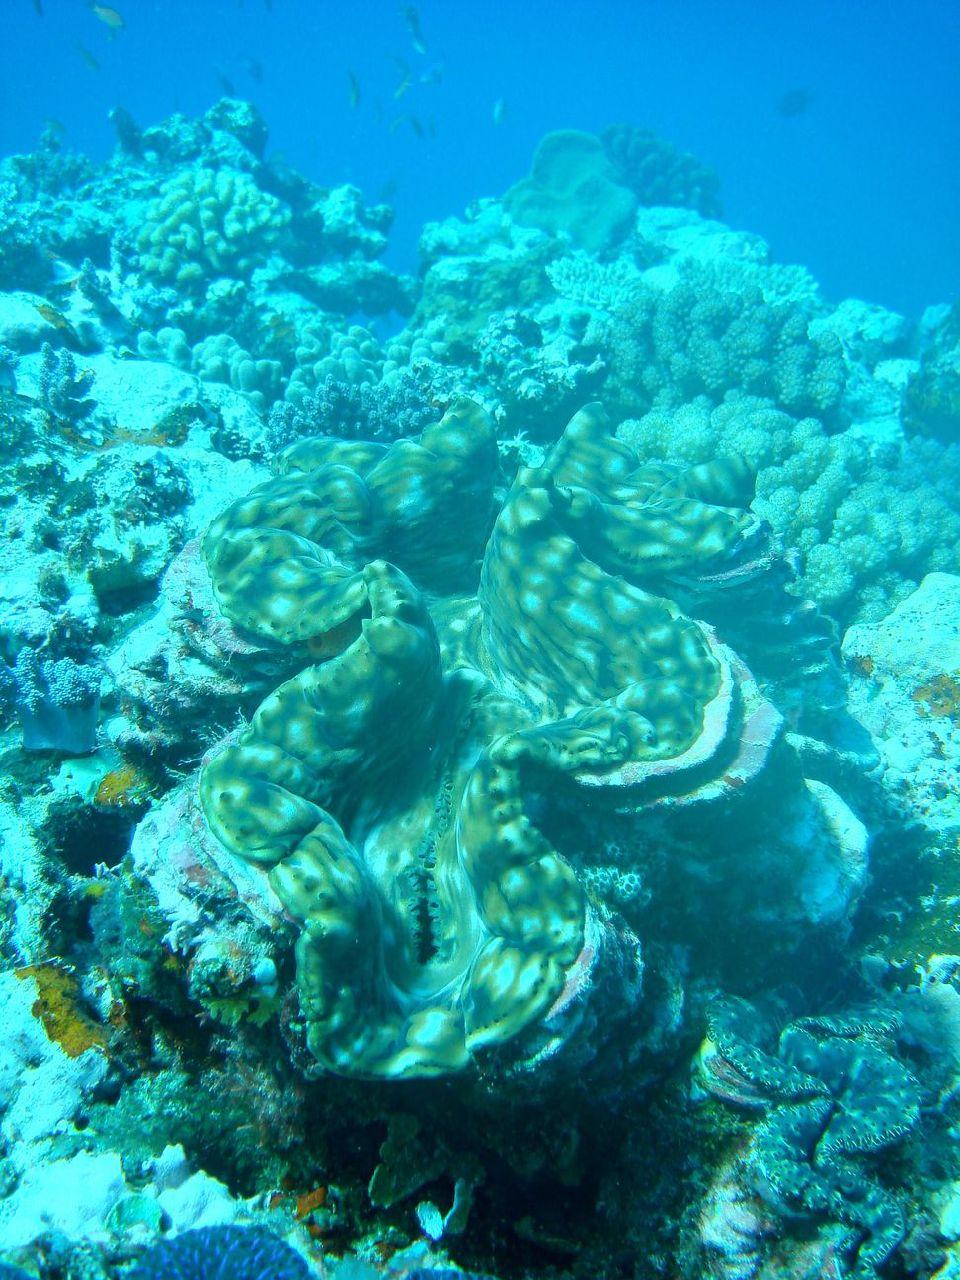 Photo plongee 3 decembre 2007 Poindimie #26